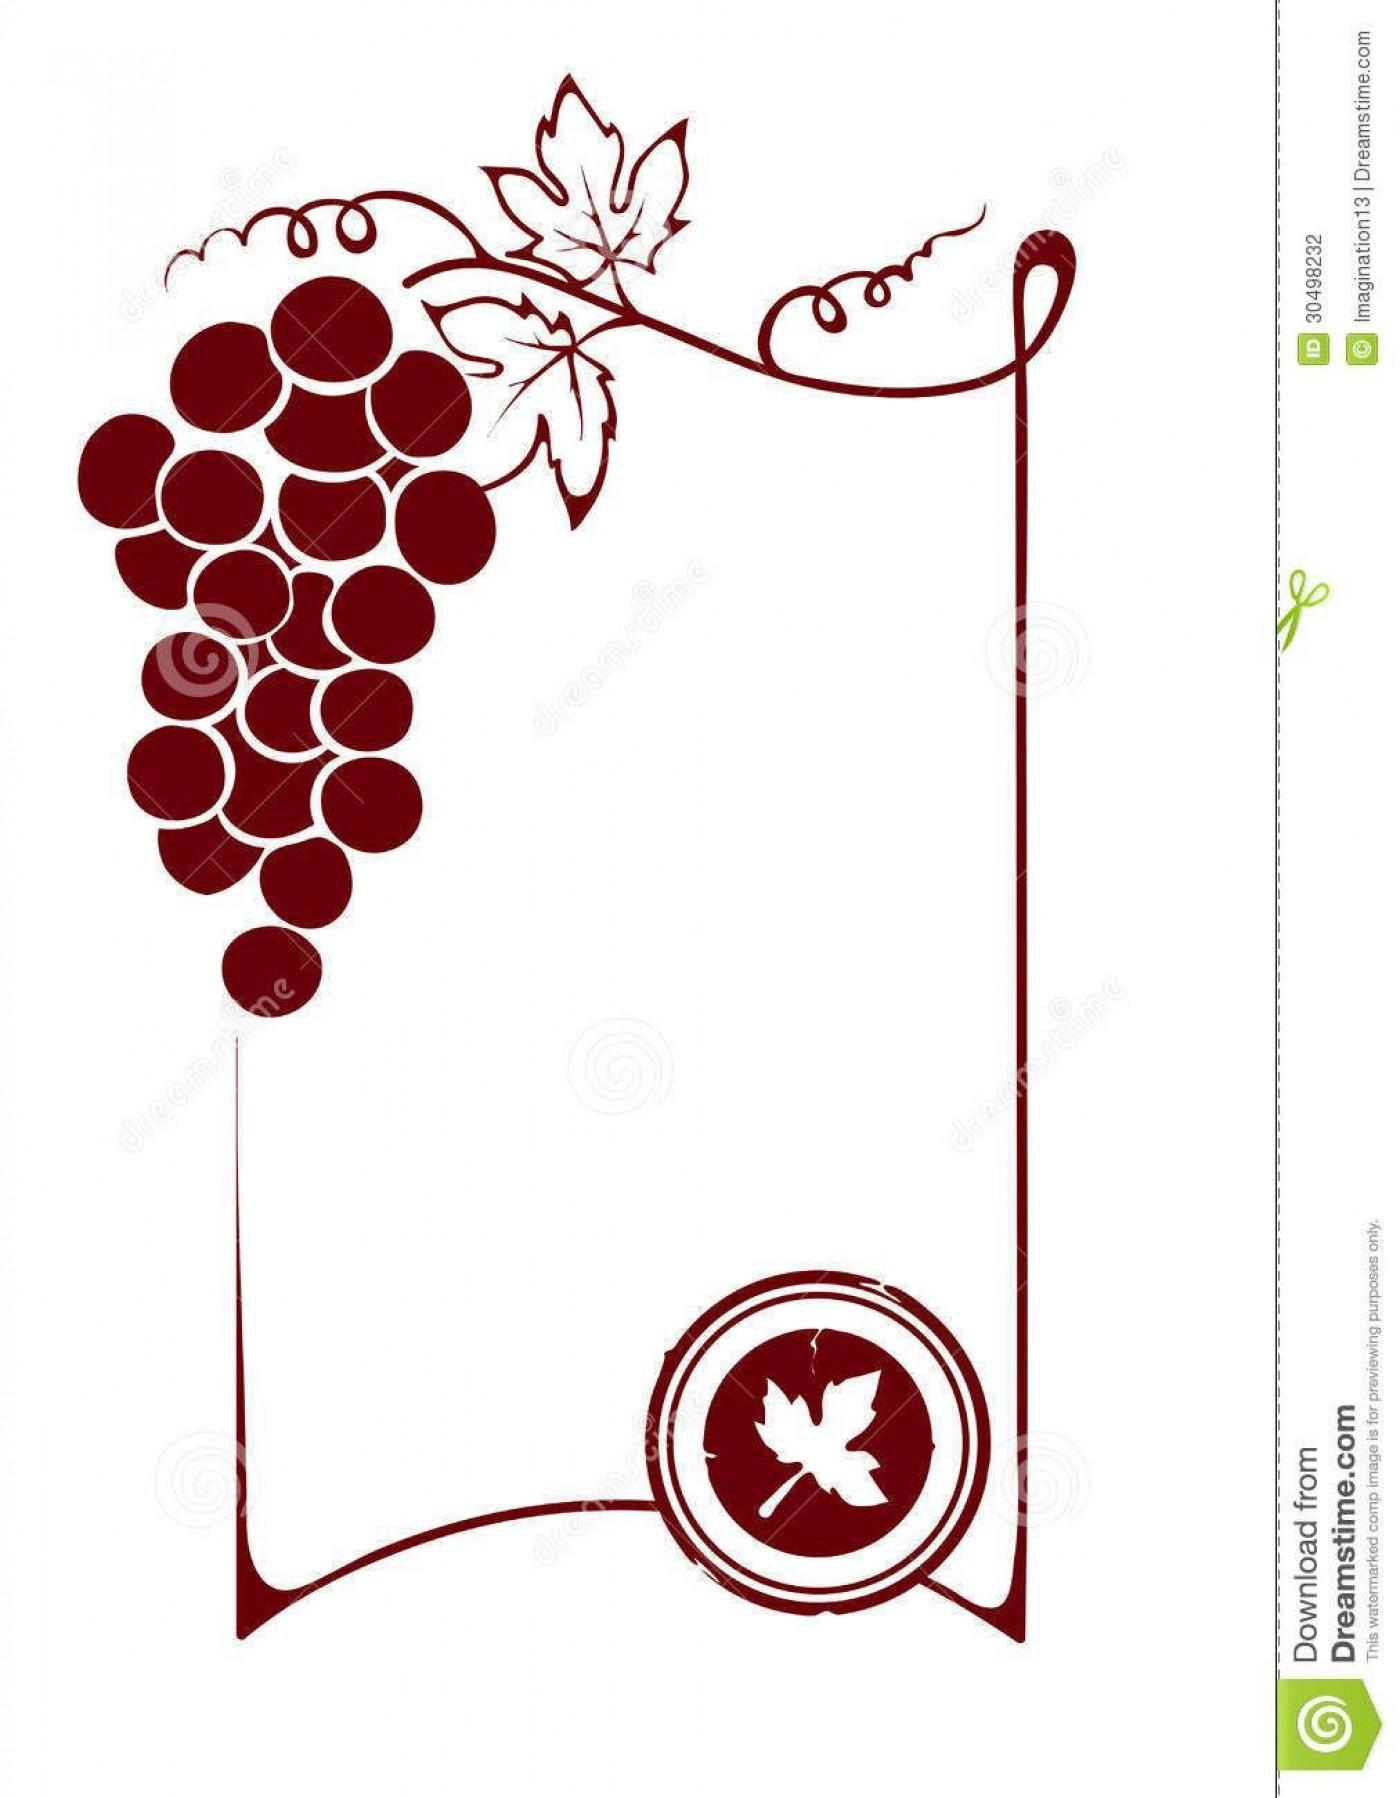 004 Imposing Free Wine Label Template Idea  Bottle Microsoft Word Online Psd1400